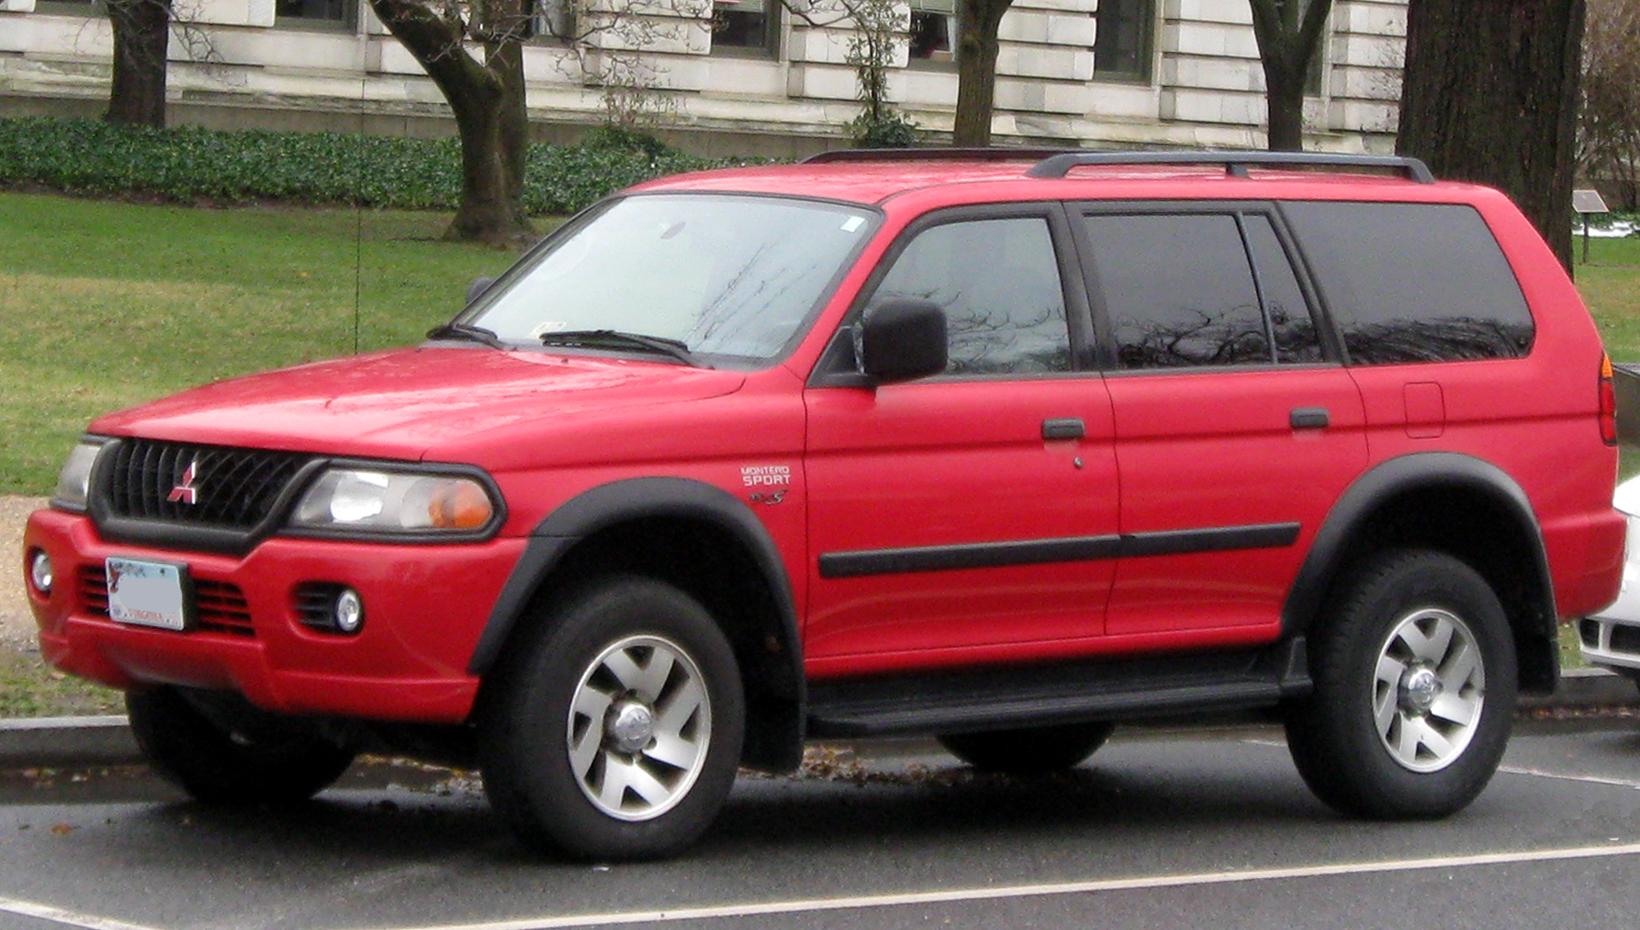 Mitsubishi Pajero Sport I Restyling 2004 - 2008 SUV 5 door #4